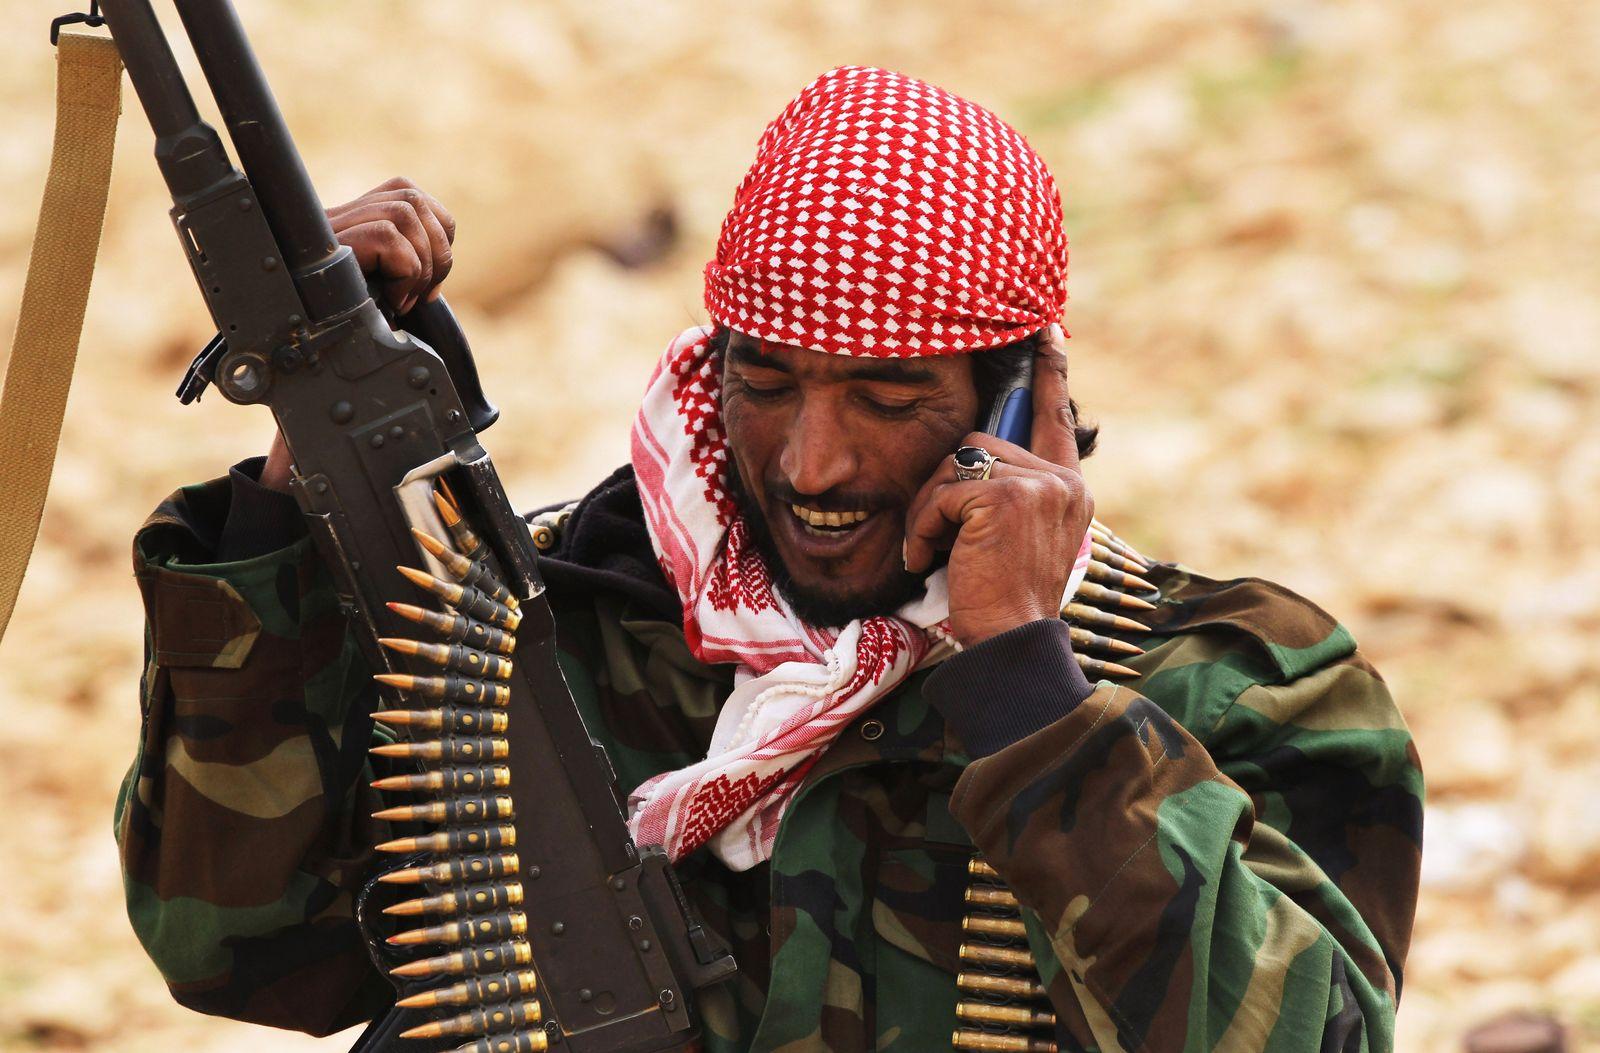 Libyen Rebell Handy Telefon Mobilfunk